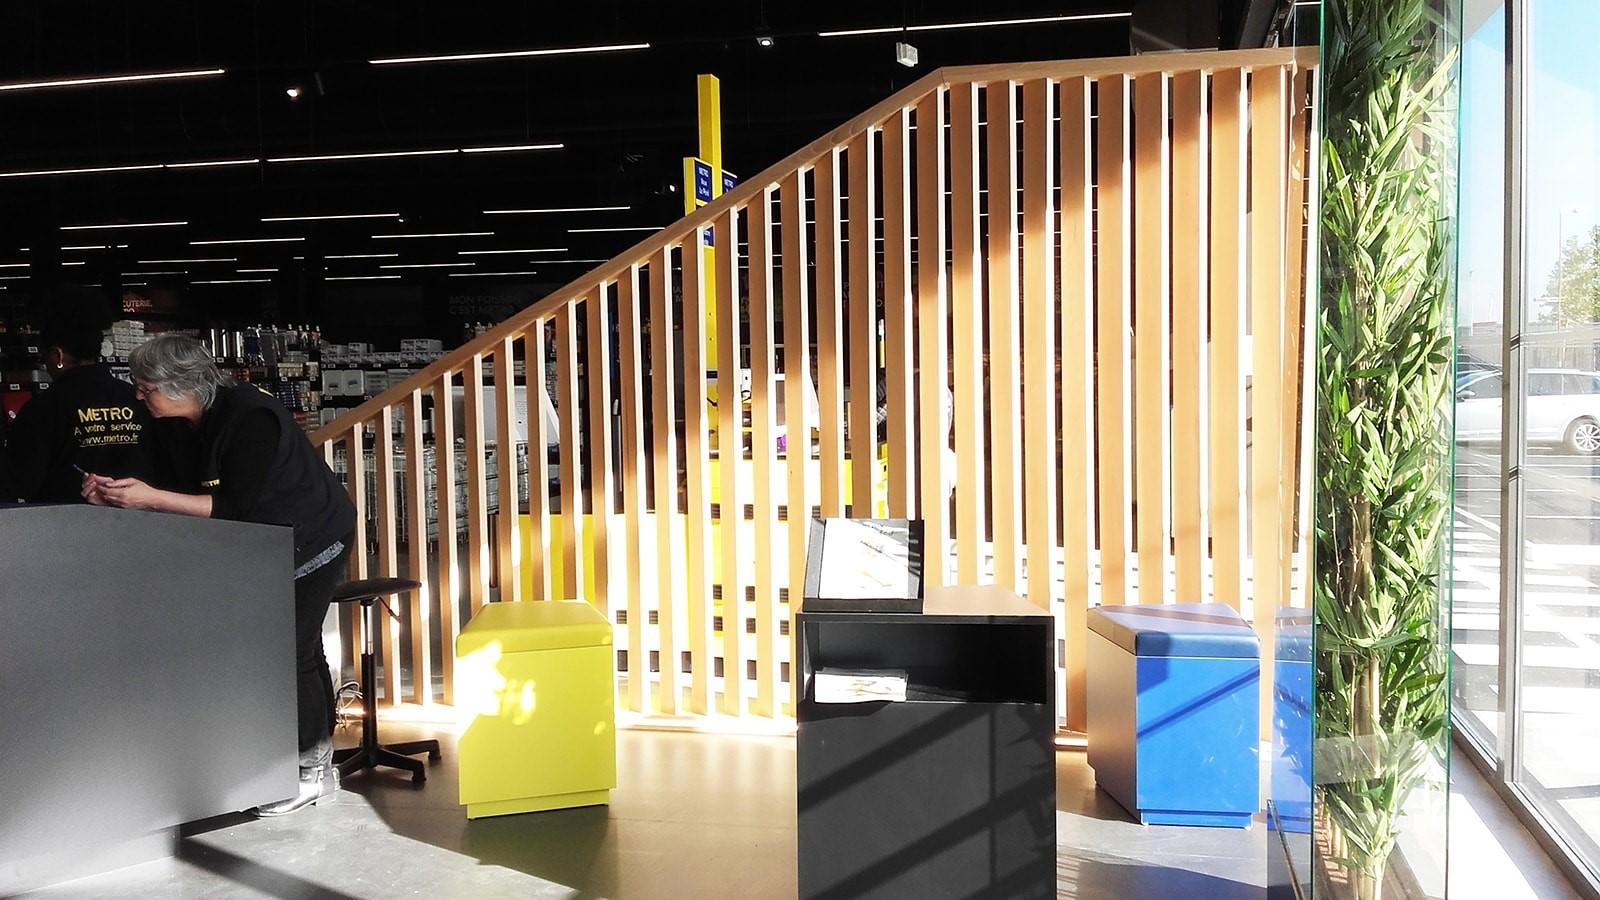 Agencement Magasins Metro Efi Design (10)